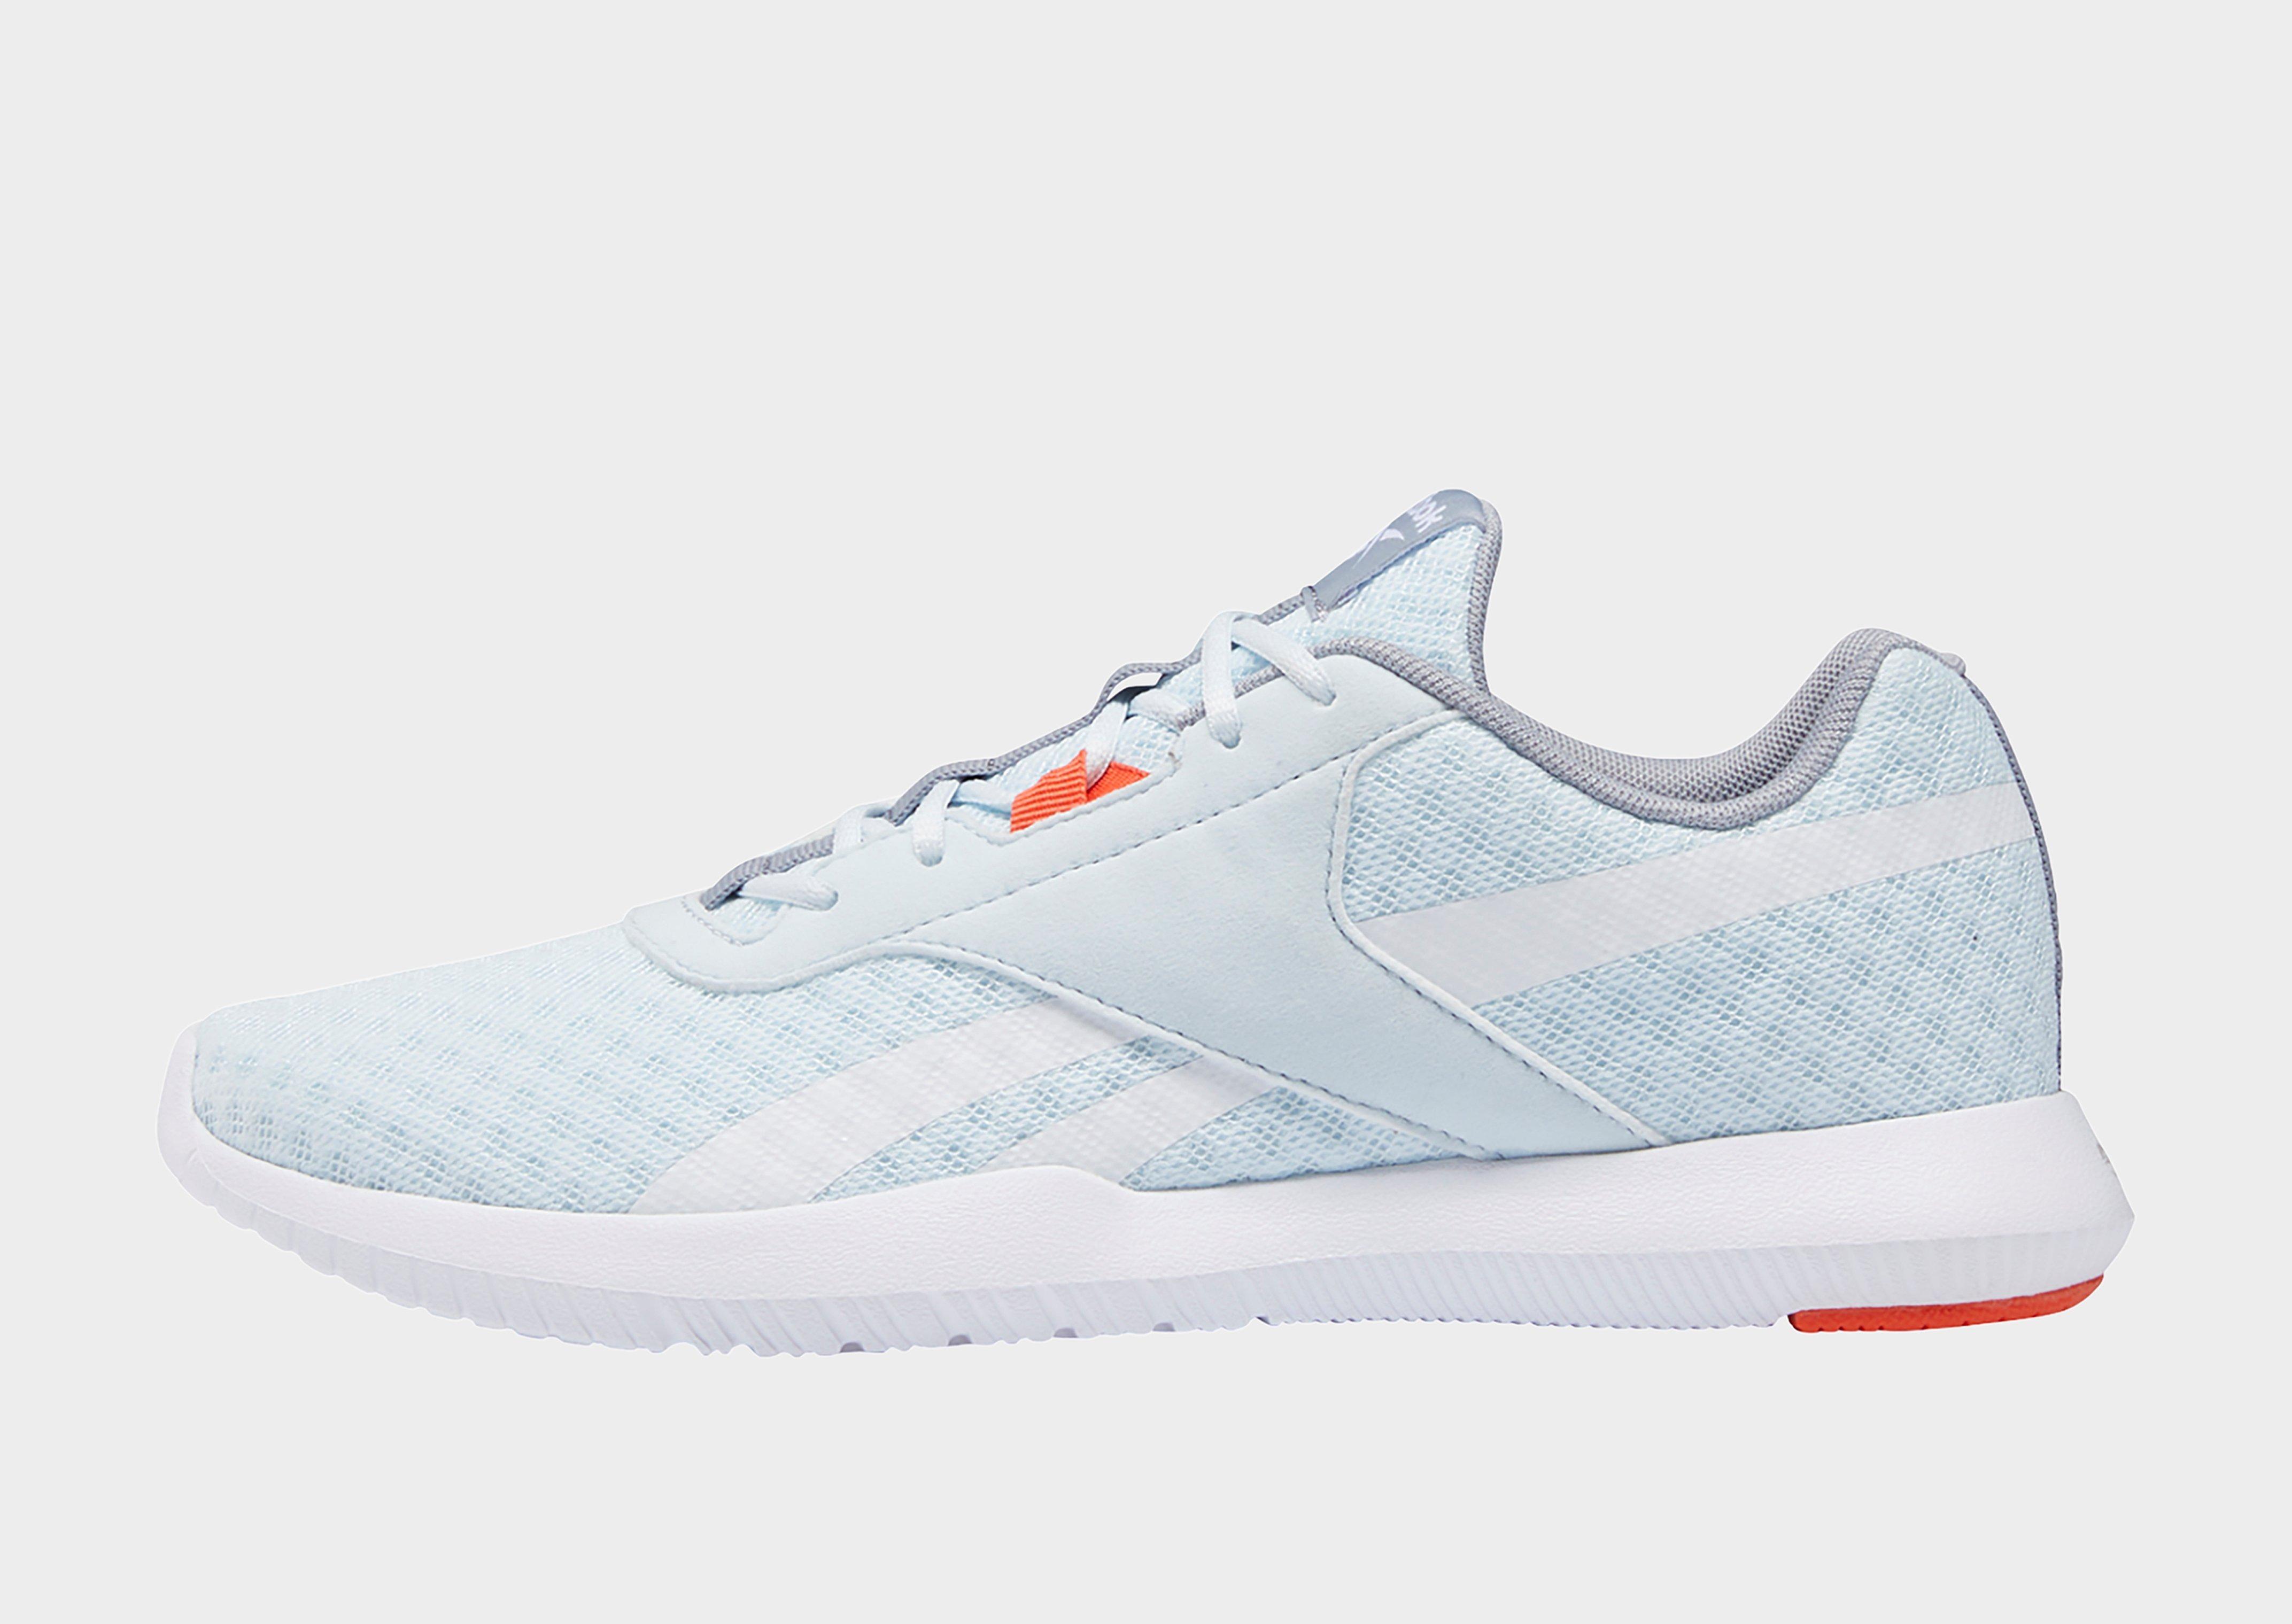 Buy Reebok Reago Essential 2.0 Shoes